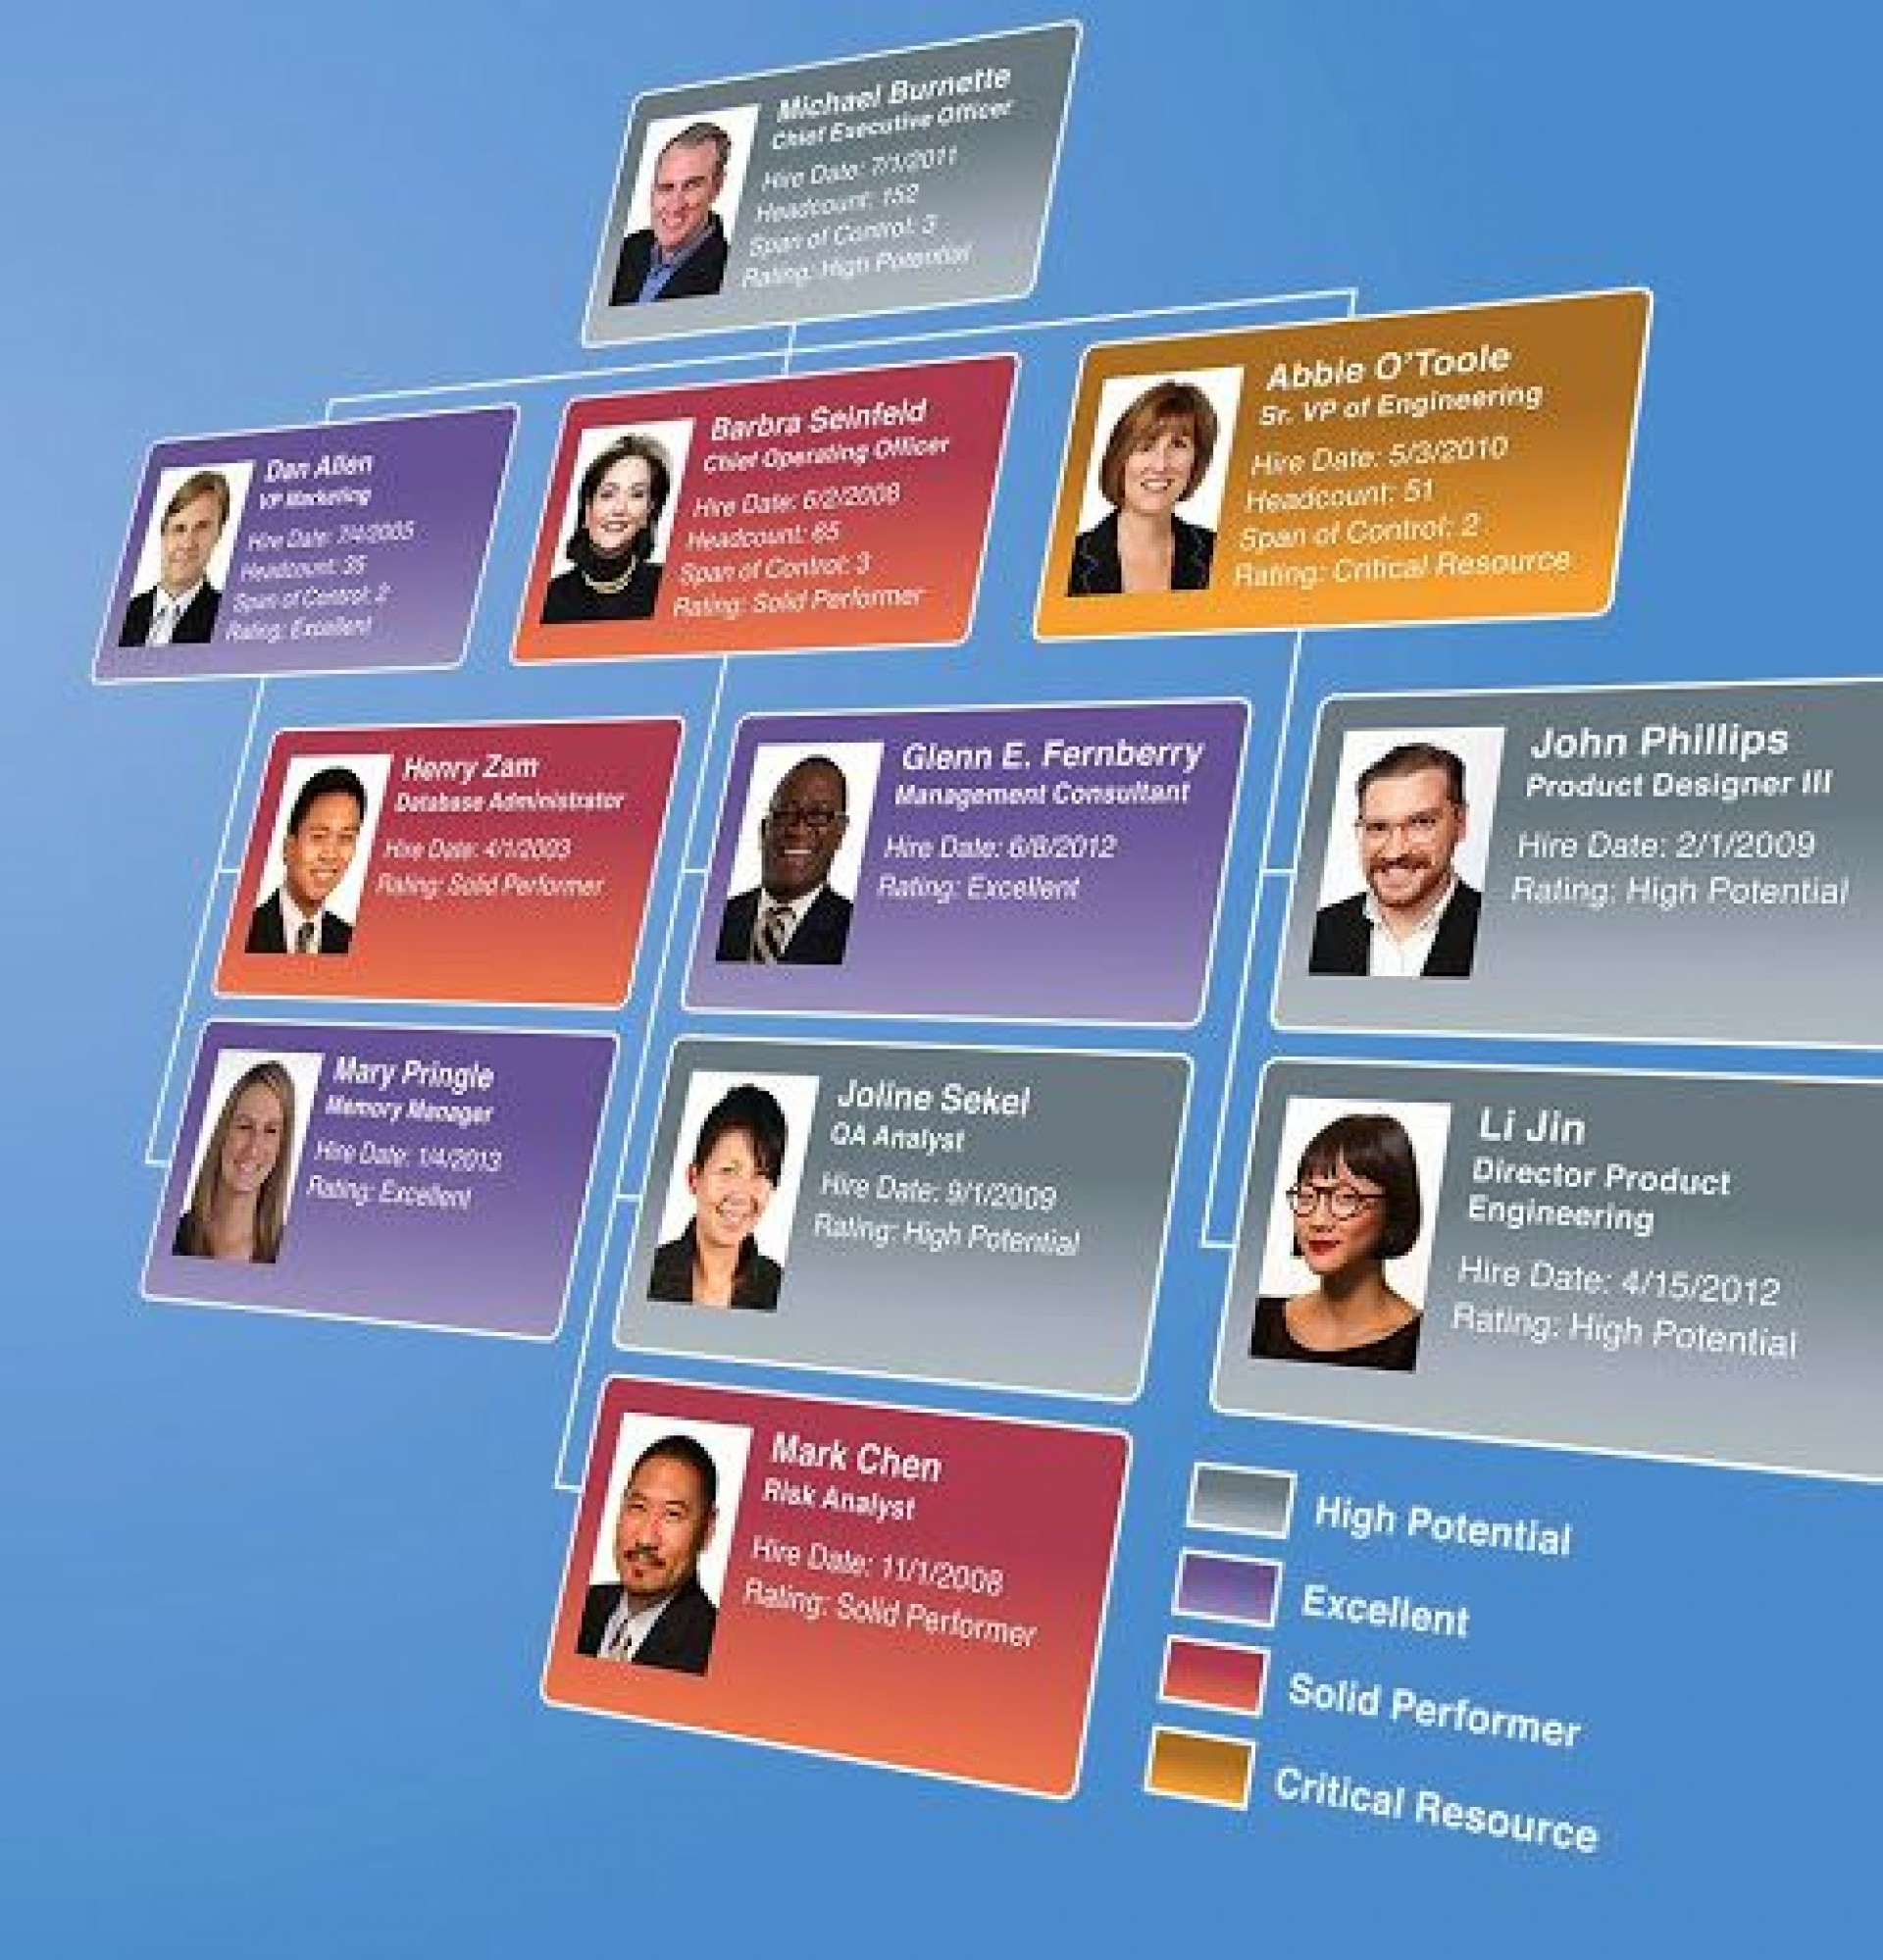 009 Archaicawful Microsoft Visio Organization Chart Template Idea  Org1920